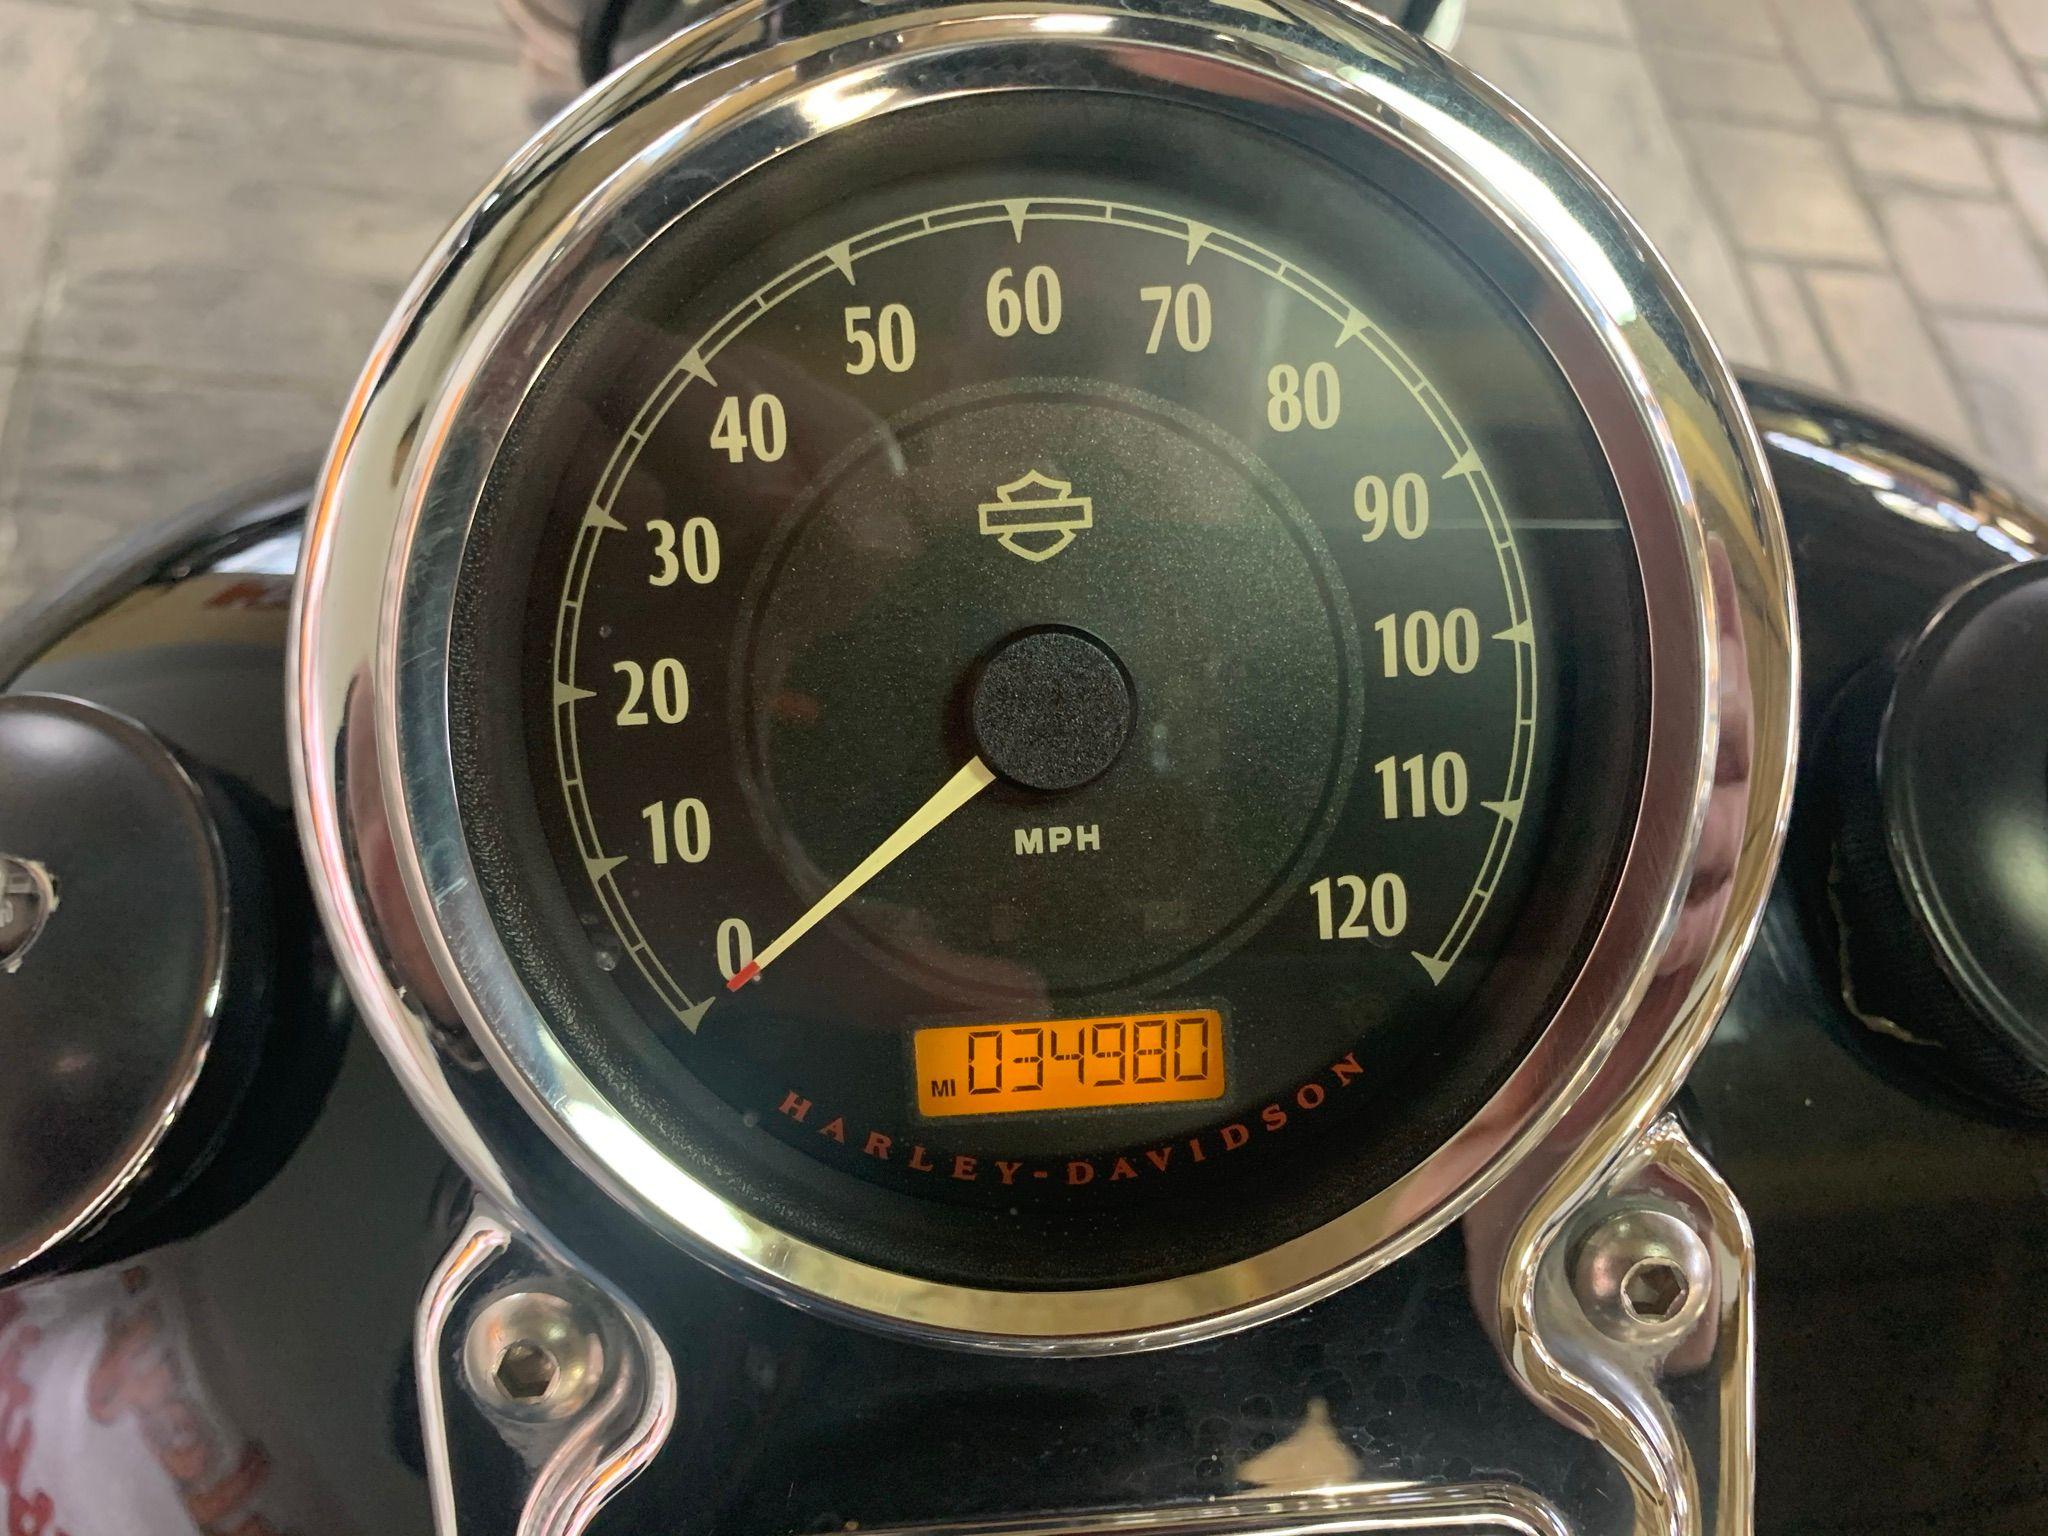 Pre-Owned 2013 Harley-Davidson Super Glide Custom